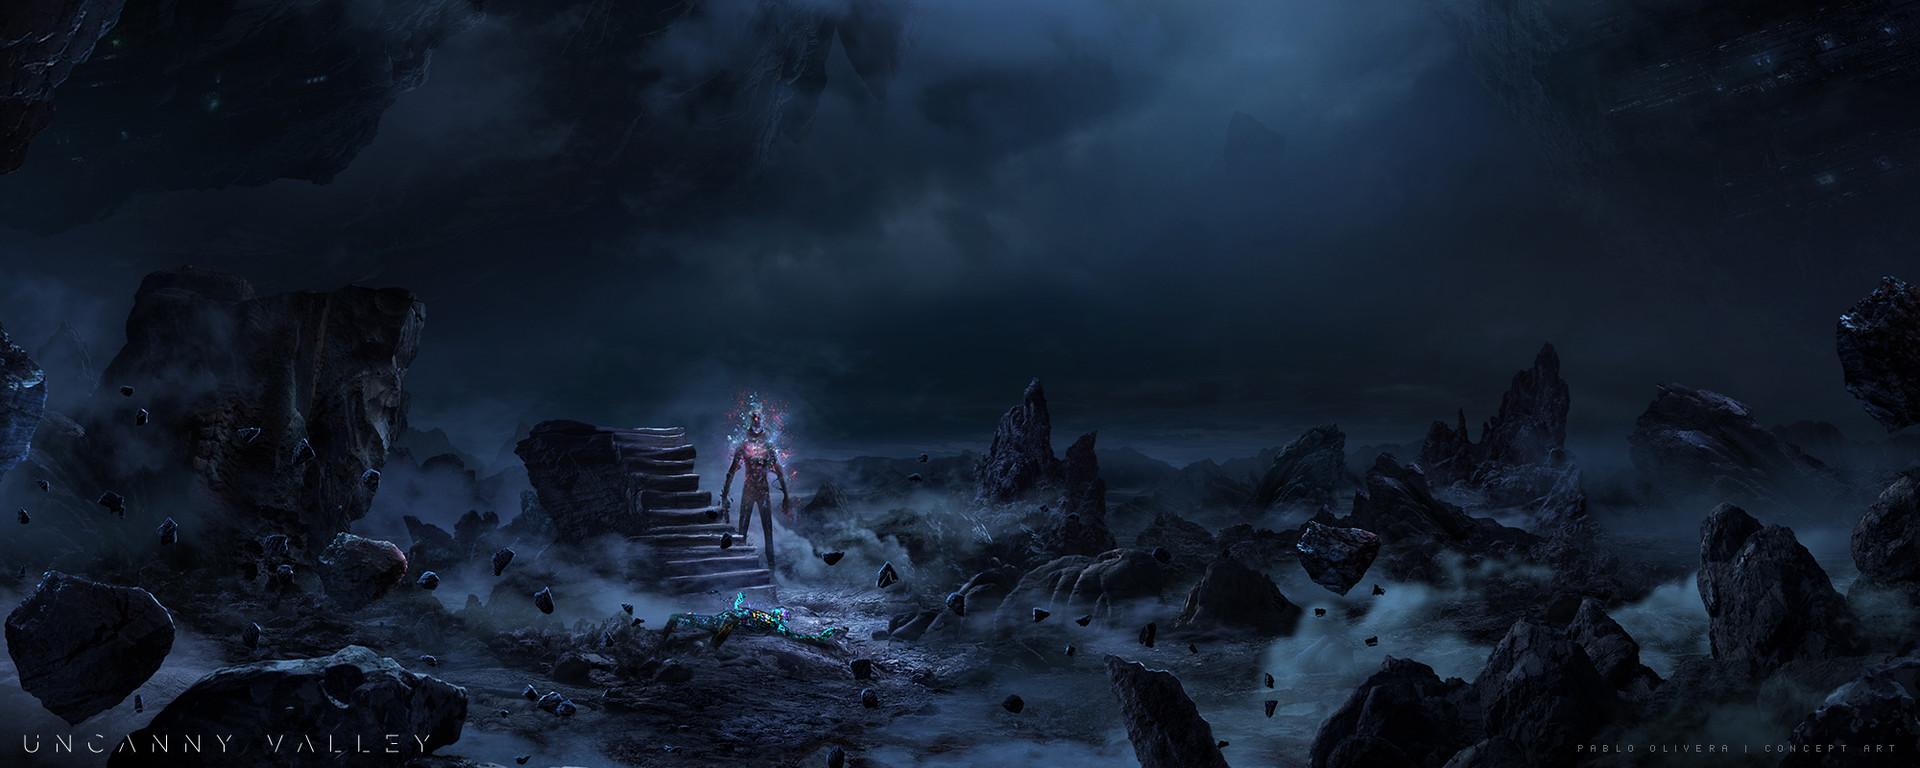 Alien VR background